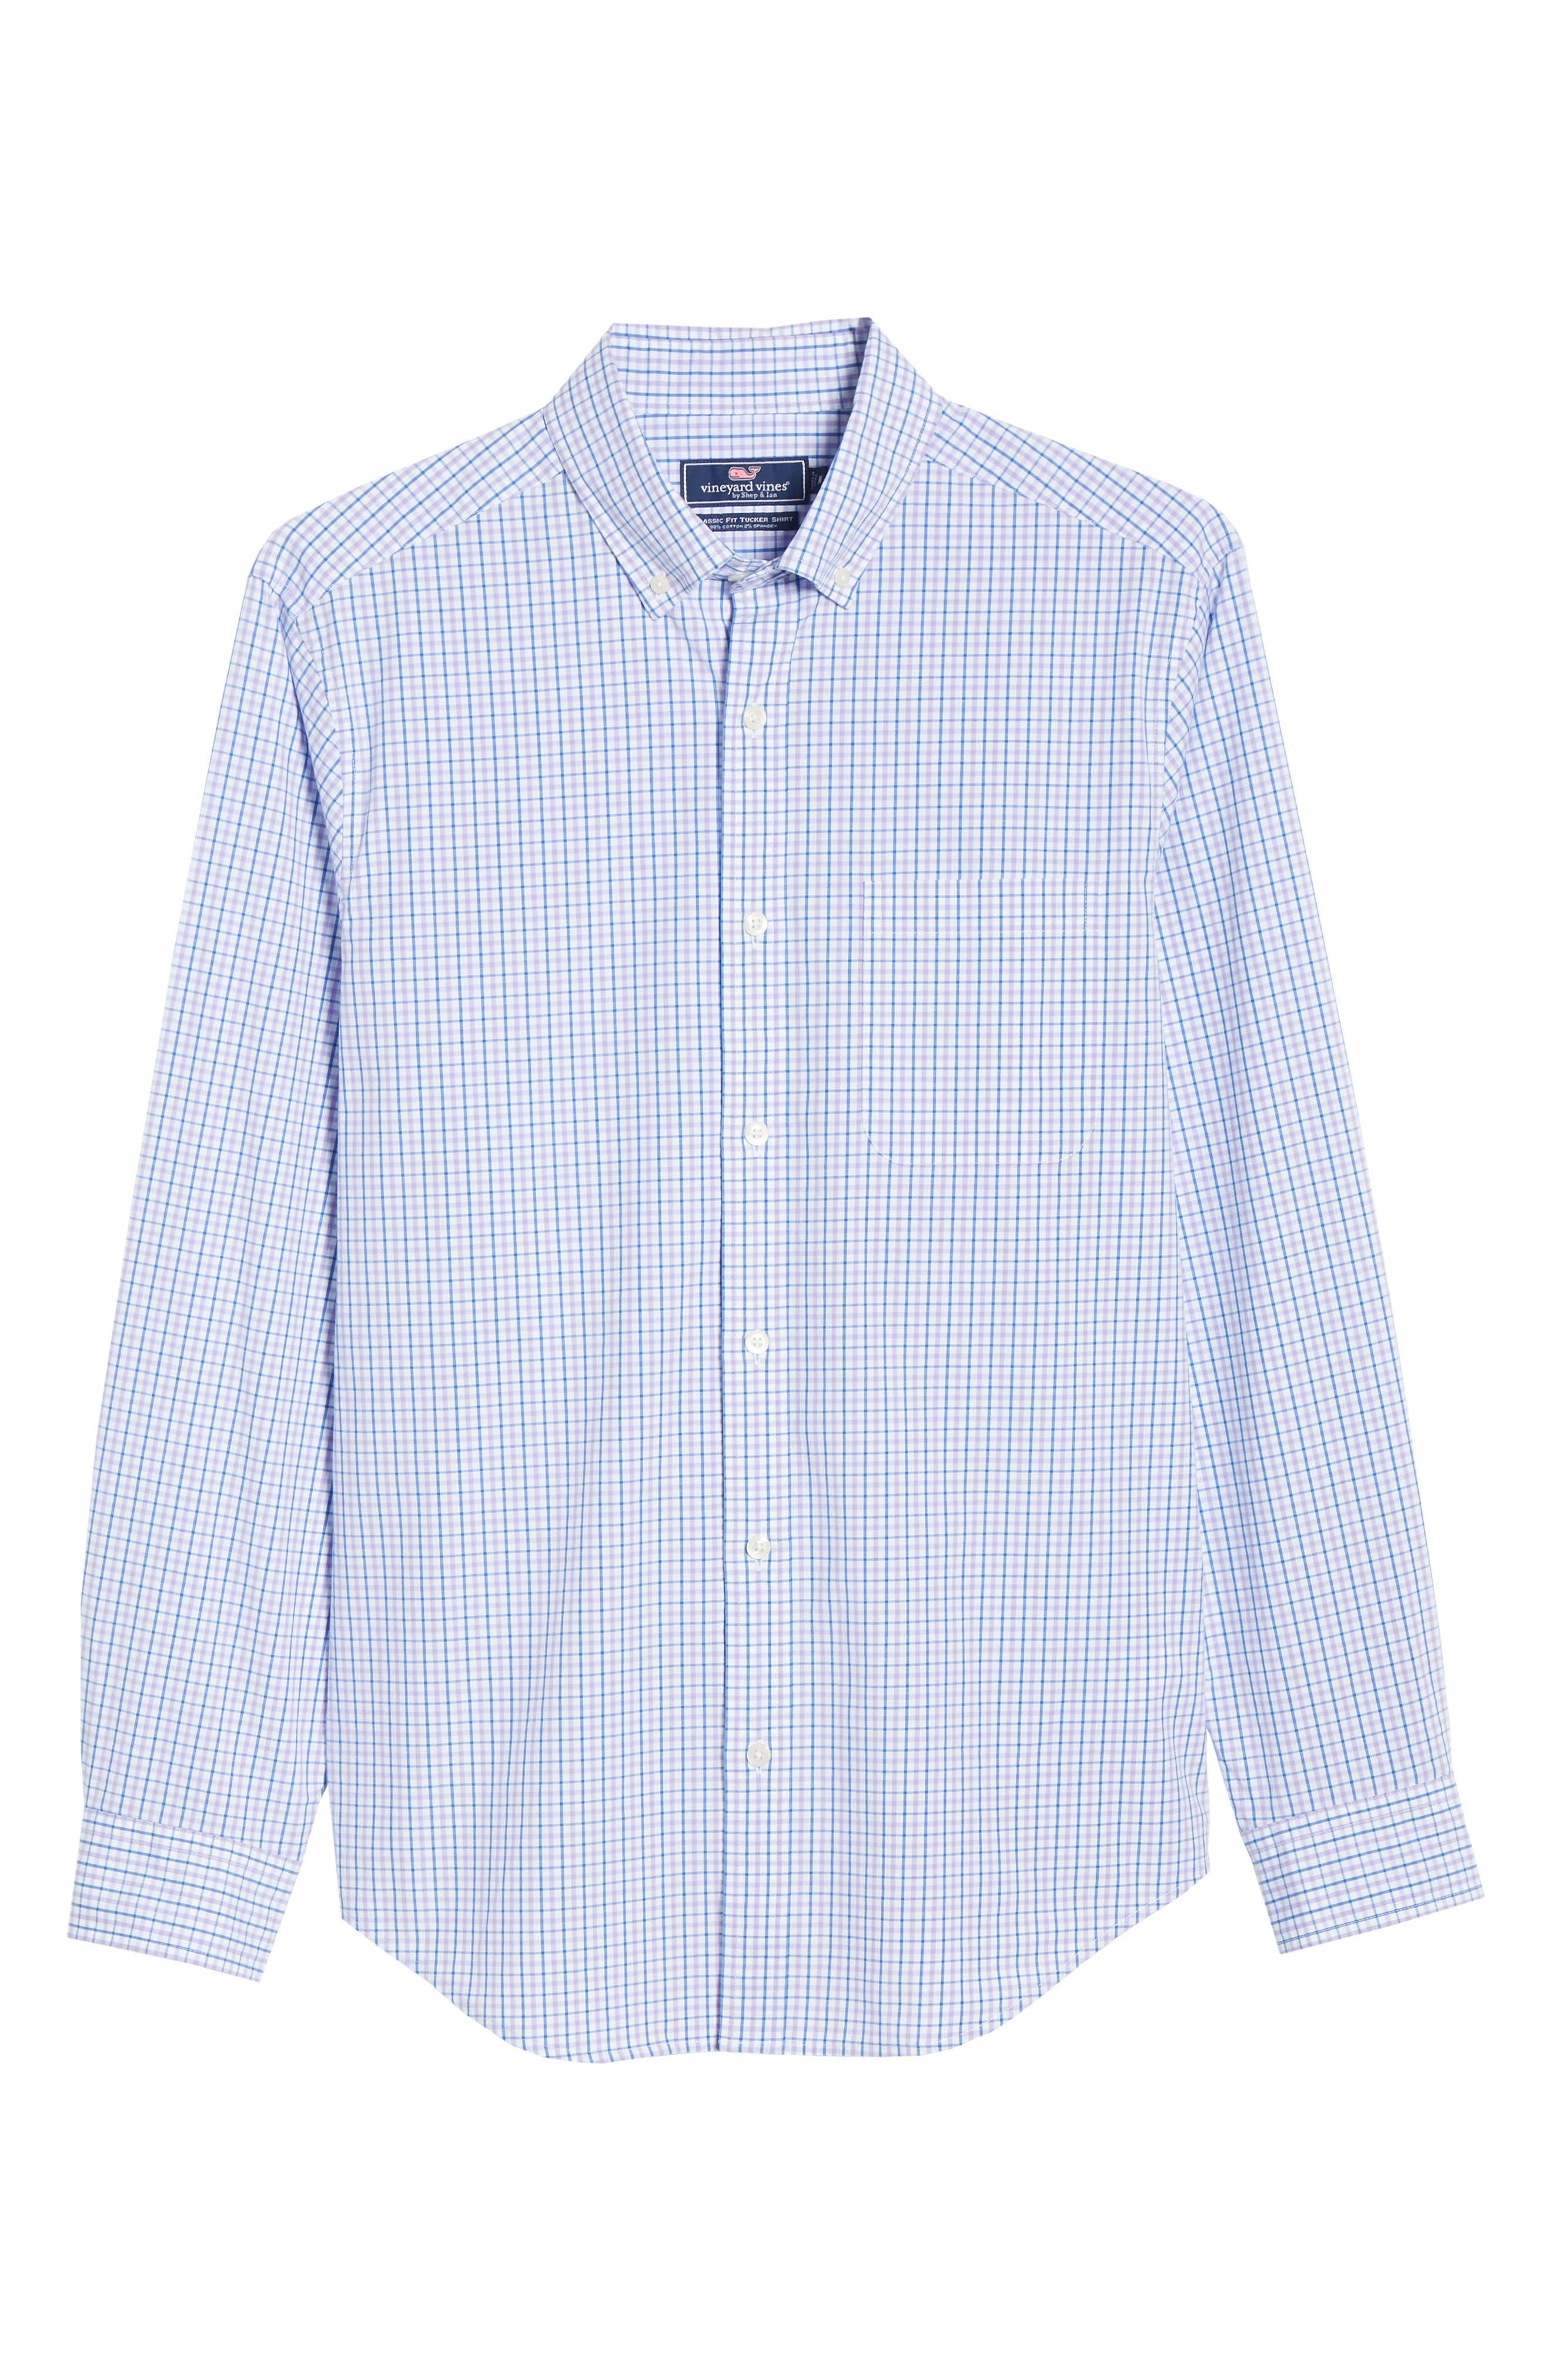 VINEYARD VINES, Tucker Regular Fit Balter Tattersall Sport Shirt, Alternate thumbnail 5, color, SEA URCHIN